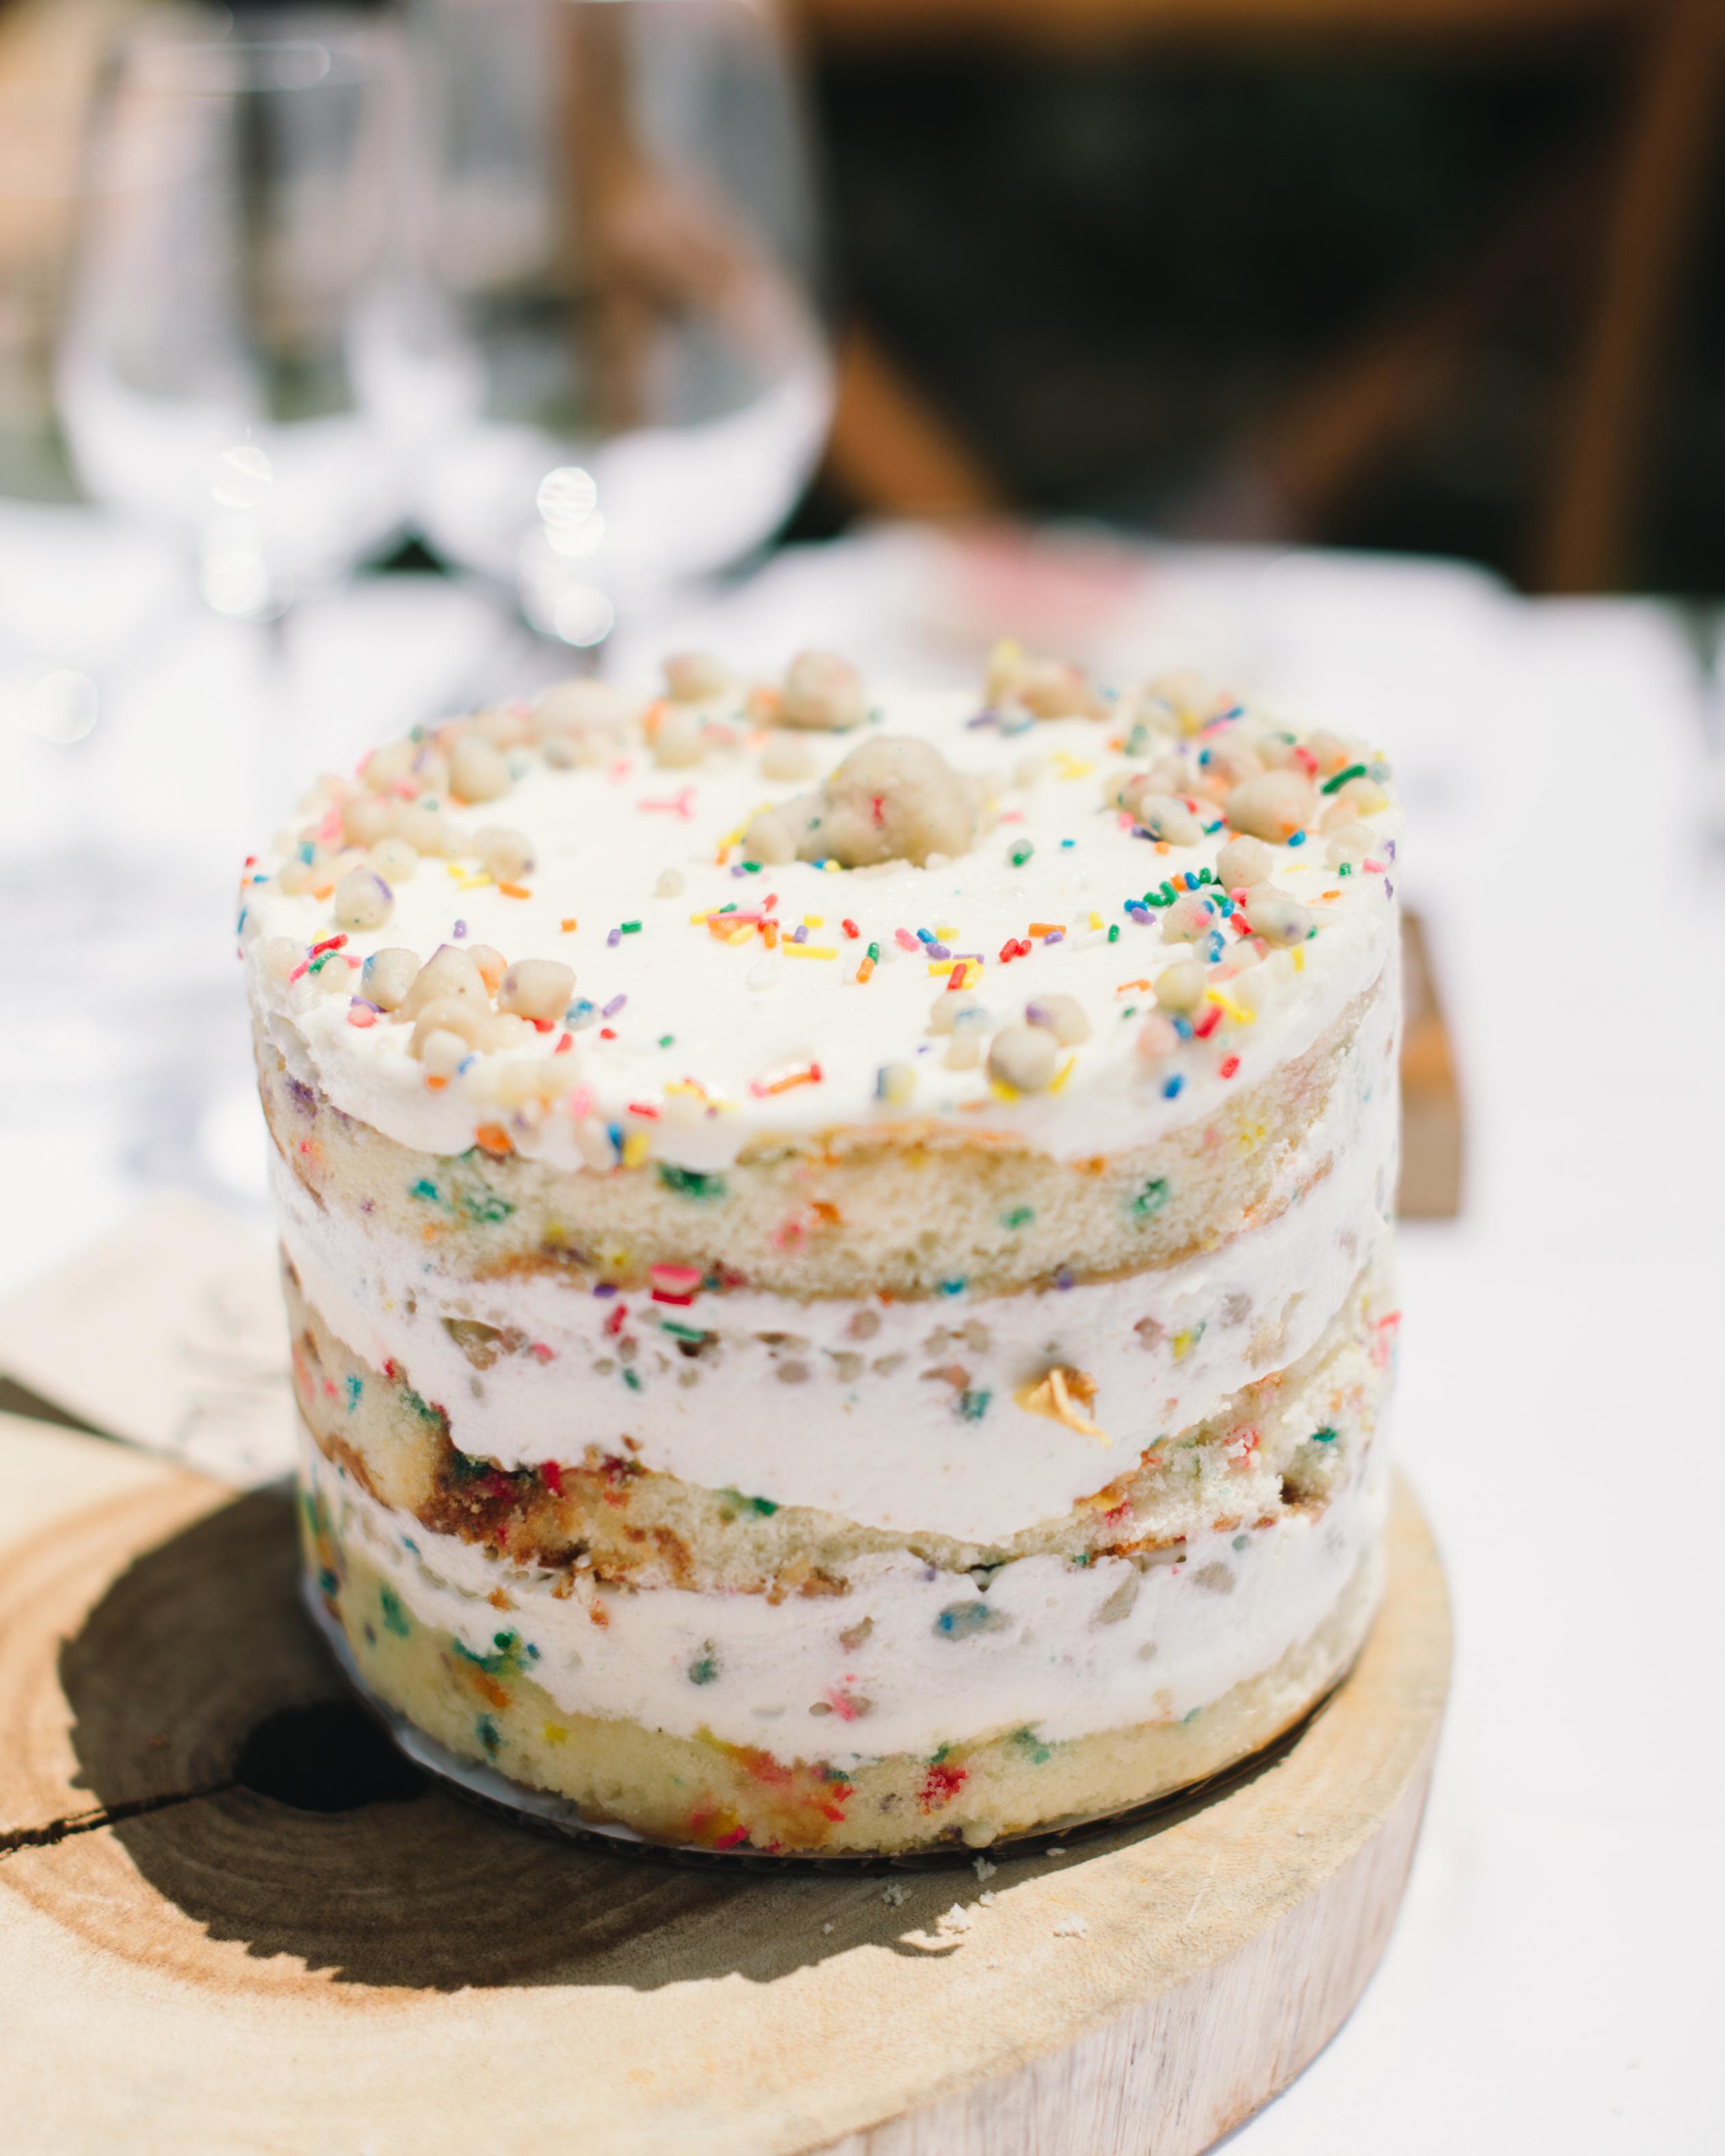 vanessa-joe-wedding-cake-7938-s111736-1214.jpg